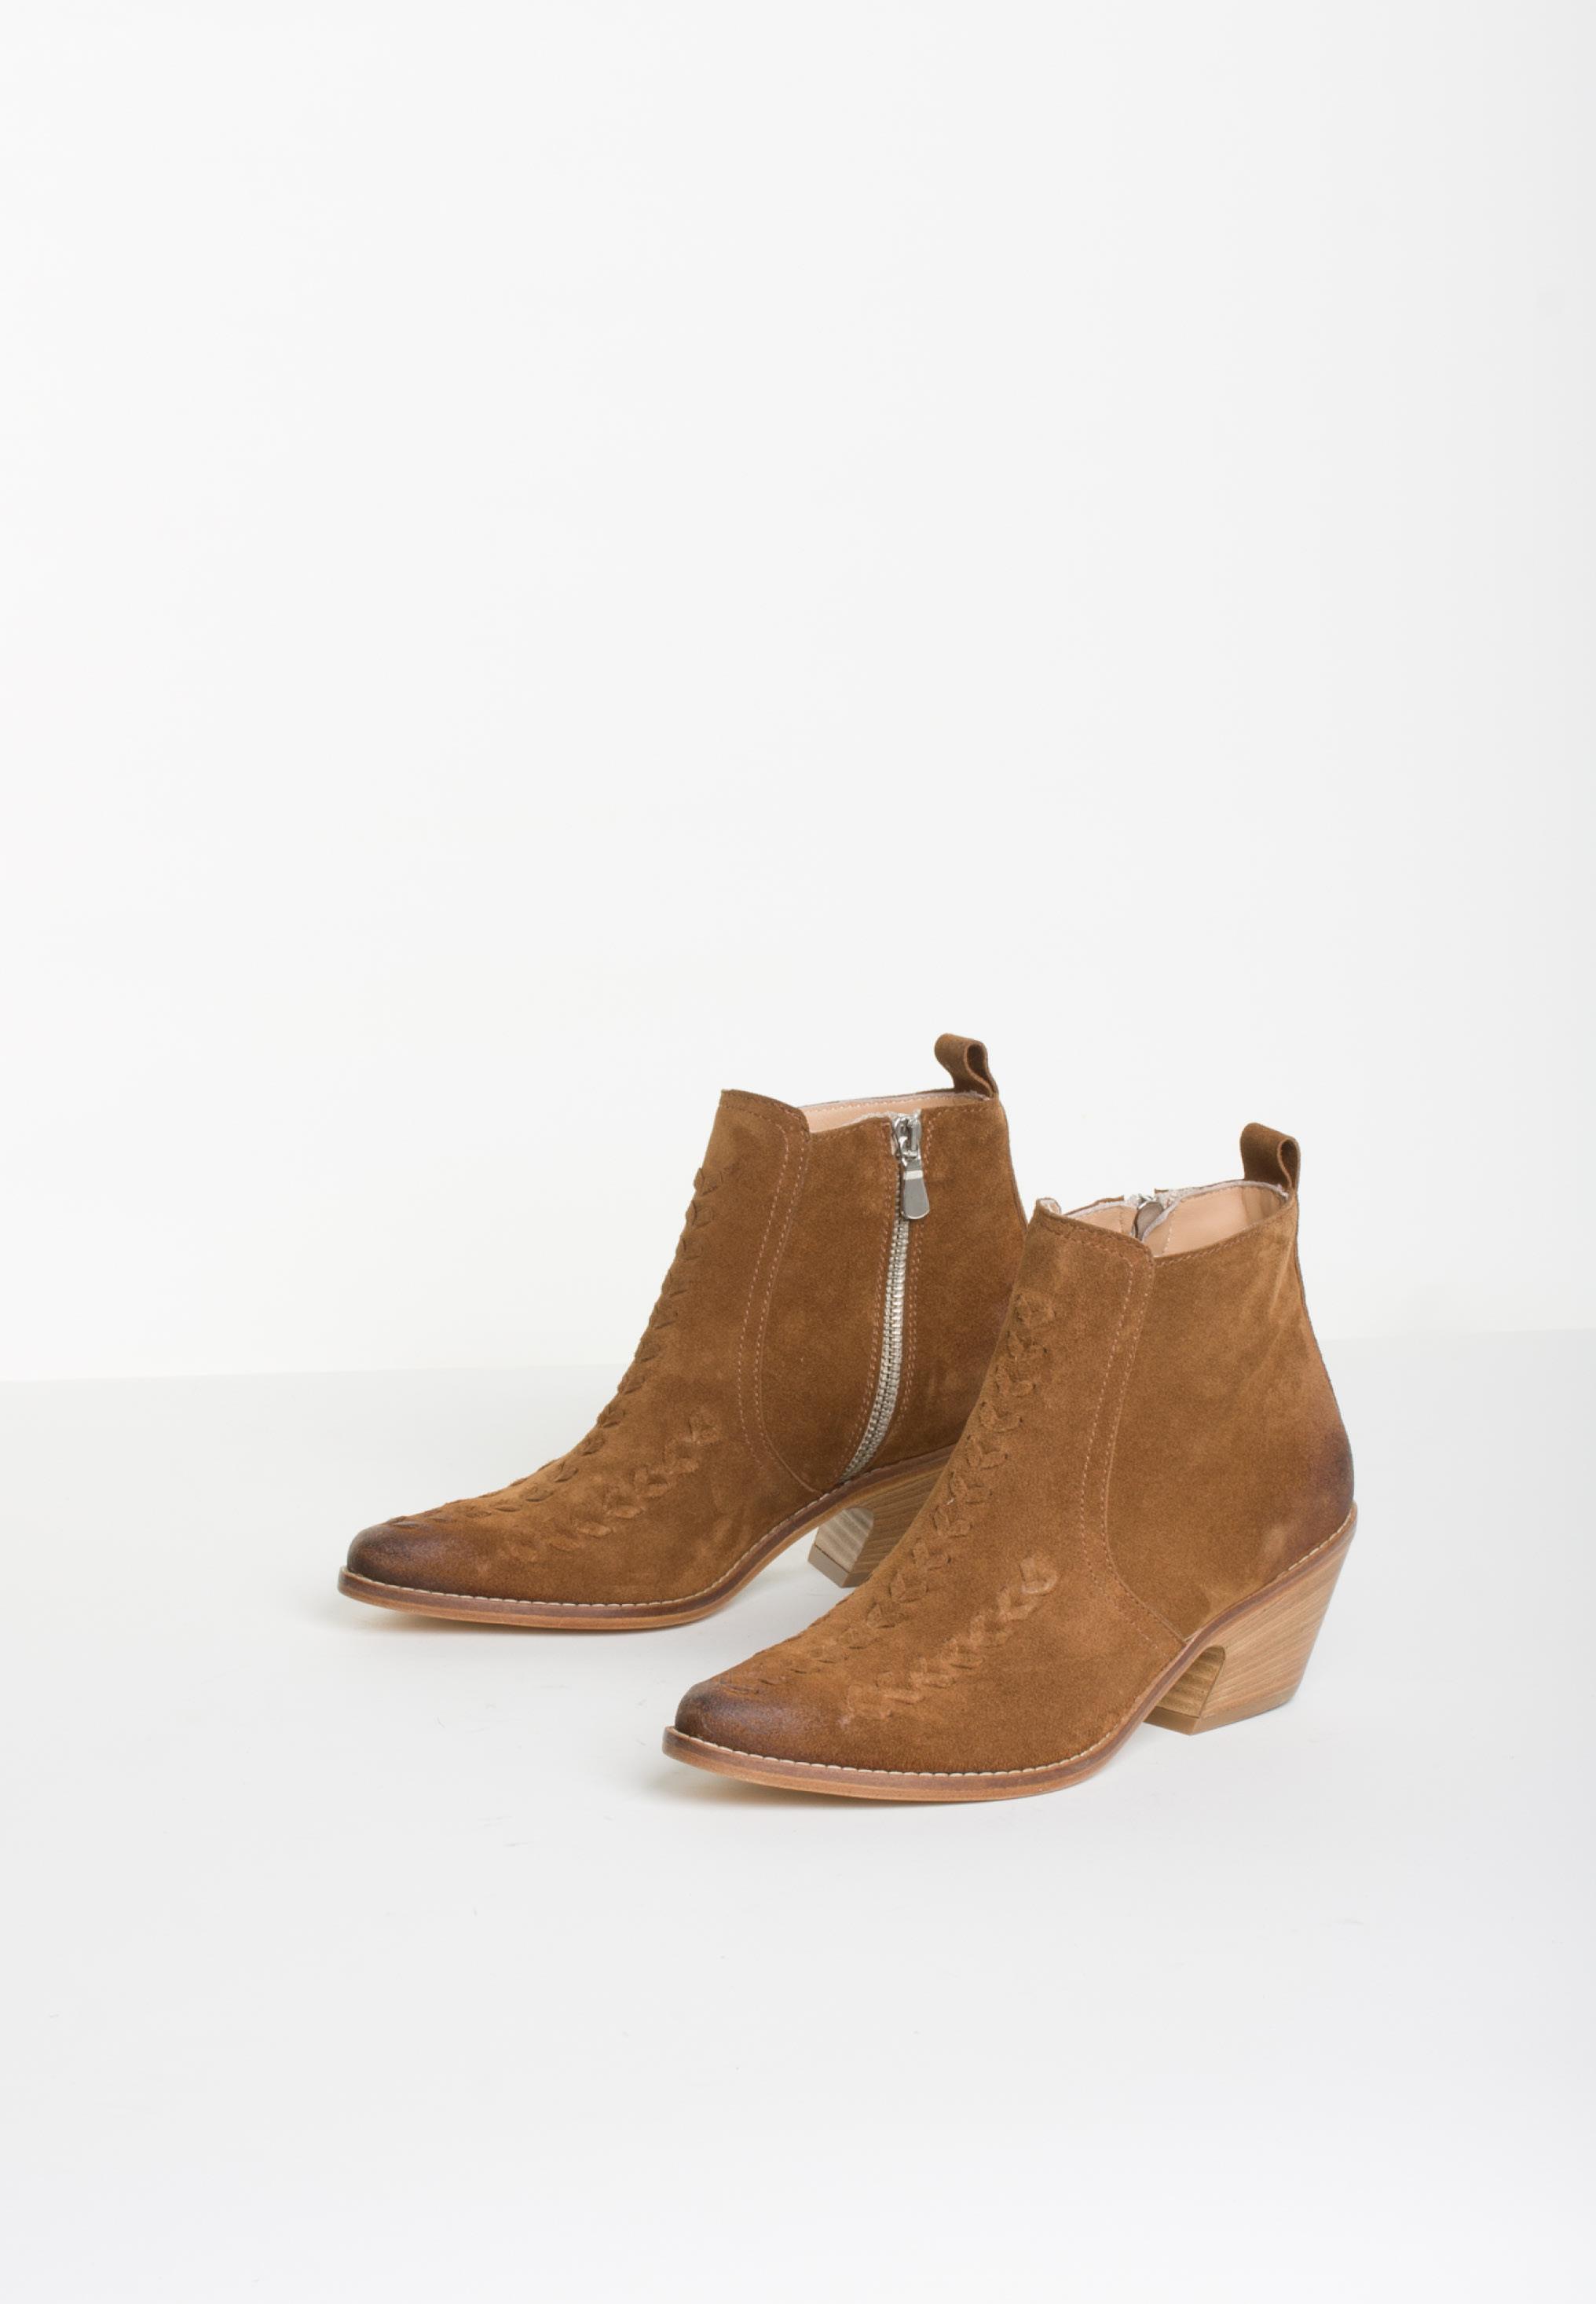 Bukela western støvle i cognac